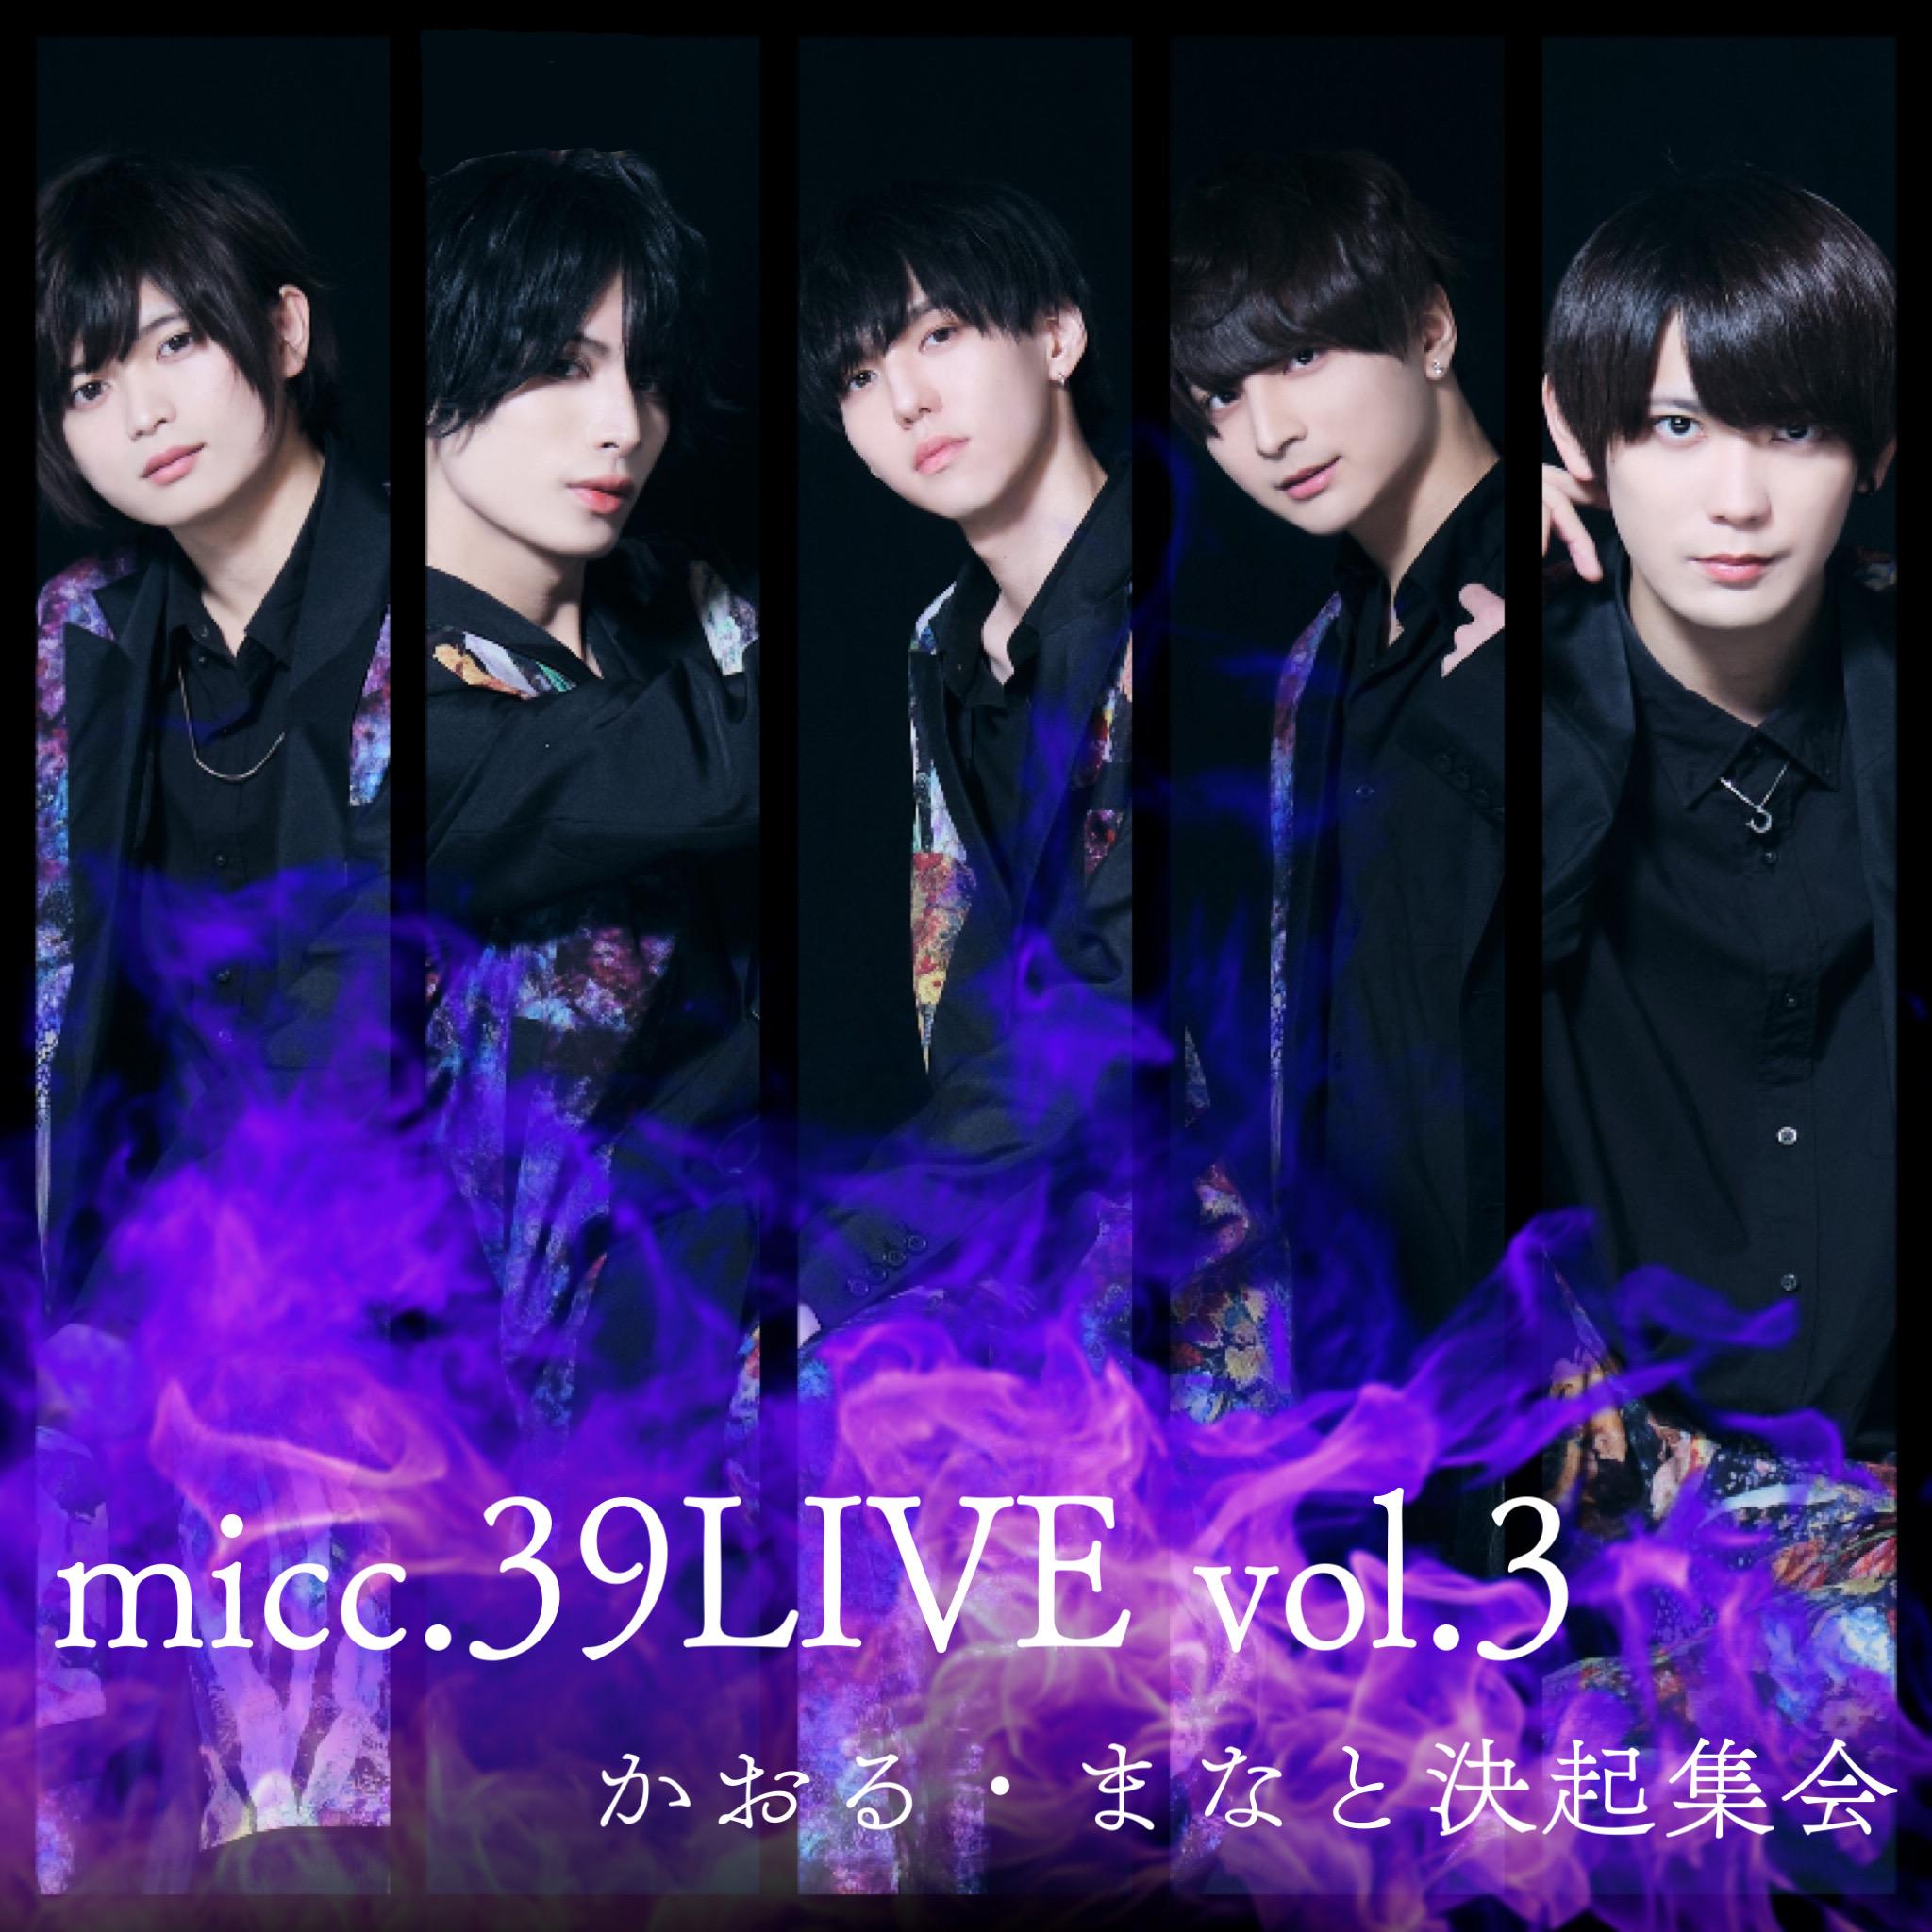 「micc.39LIVE vol.3 かおる・まなと決起集会」